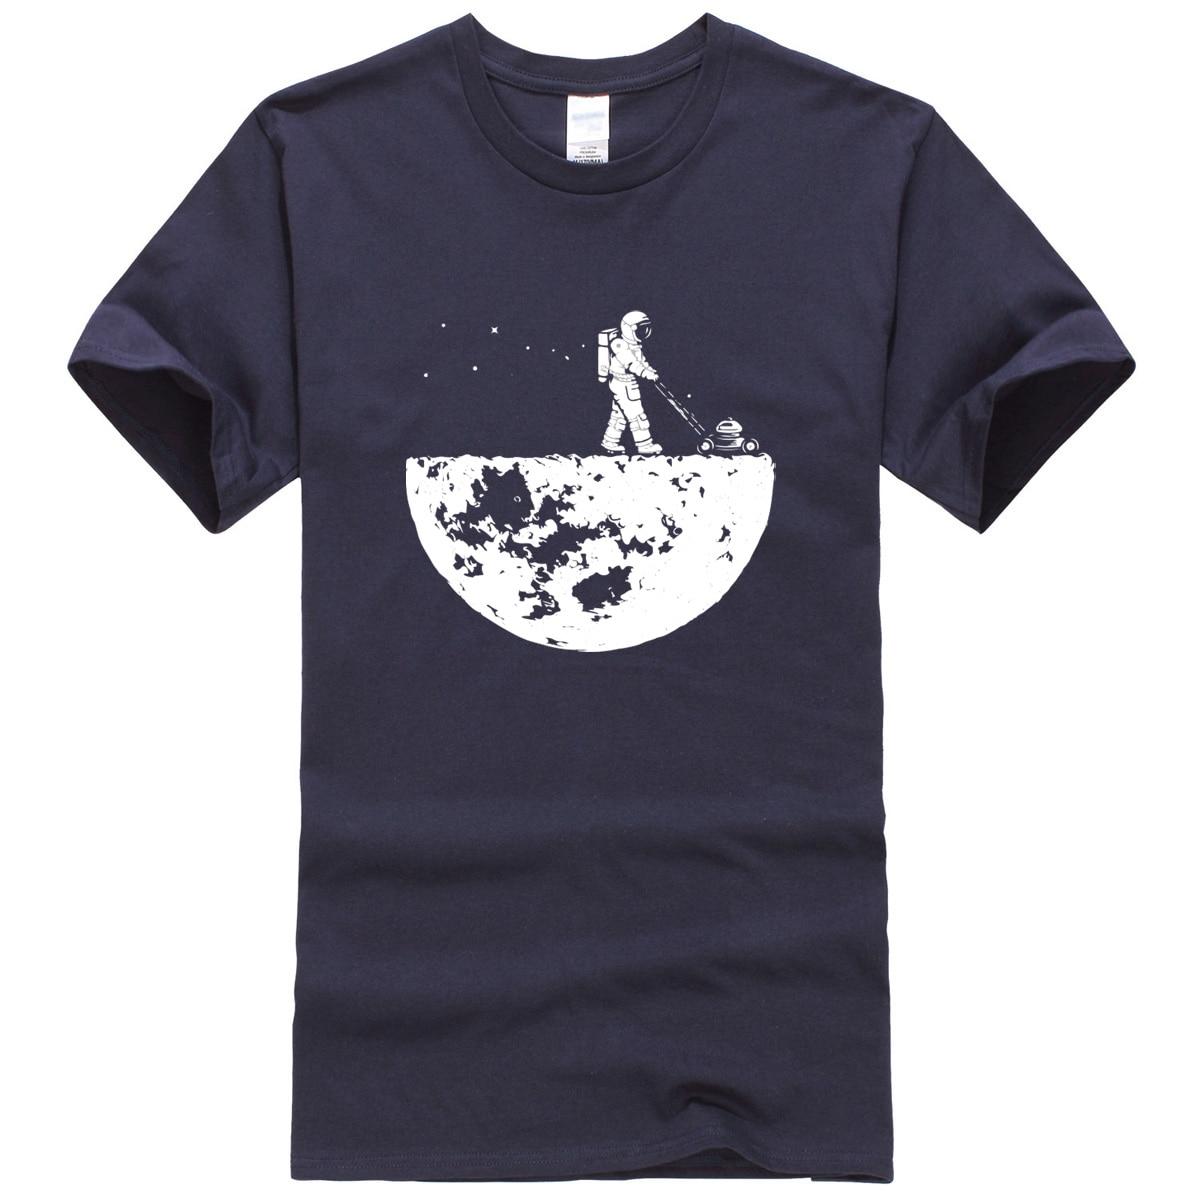 Hot sale 2019 summer men   t  -  shirt   novelty design Develop The Moon cotton brand men's   t     shirt   harajuku fitness tops tshirt kpop